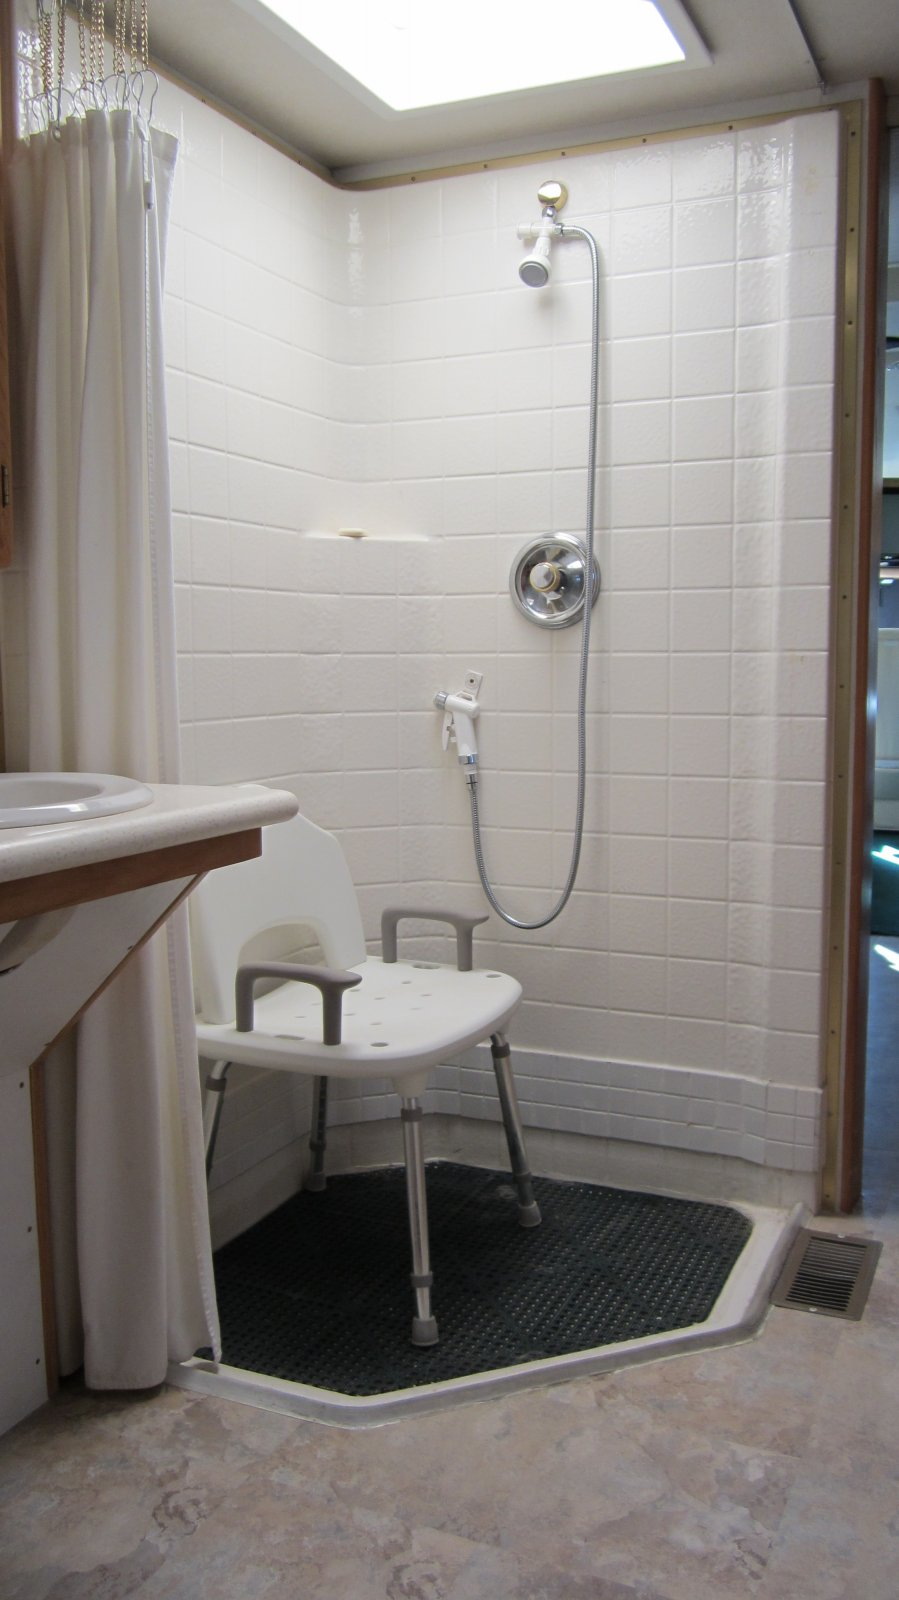 Shower Door Removal Irv2 Forums